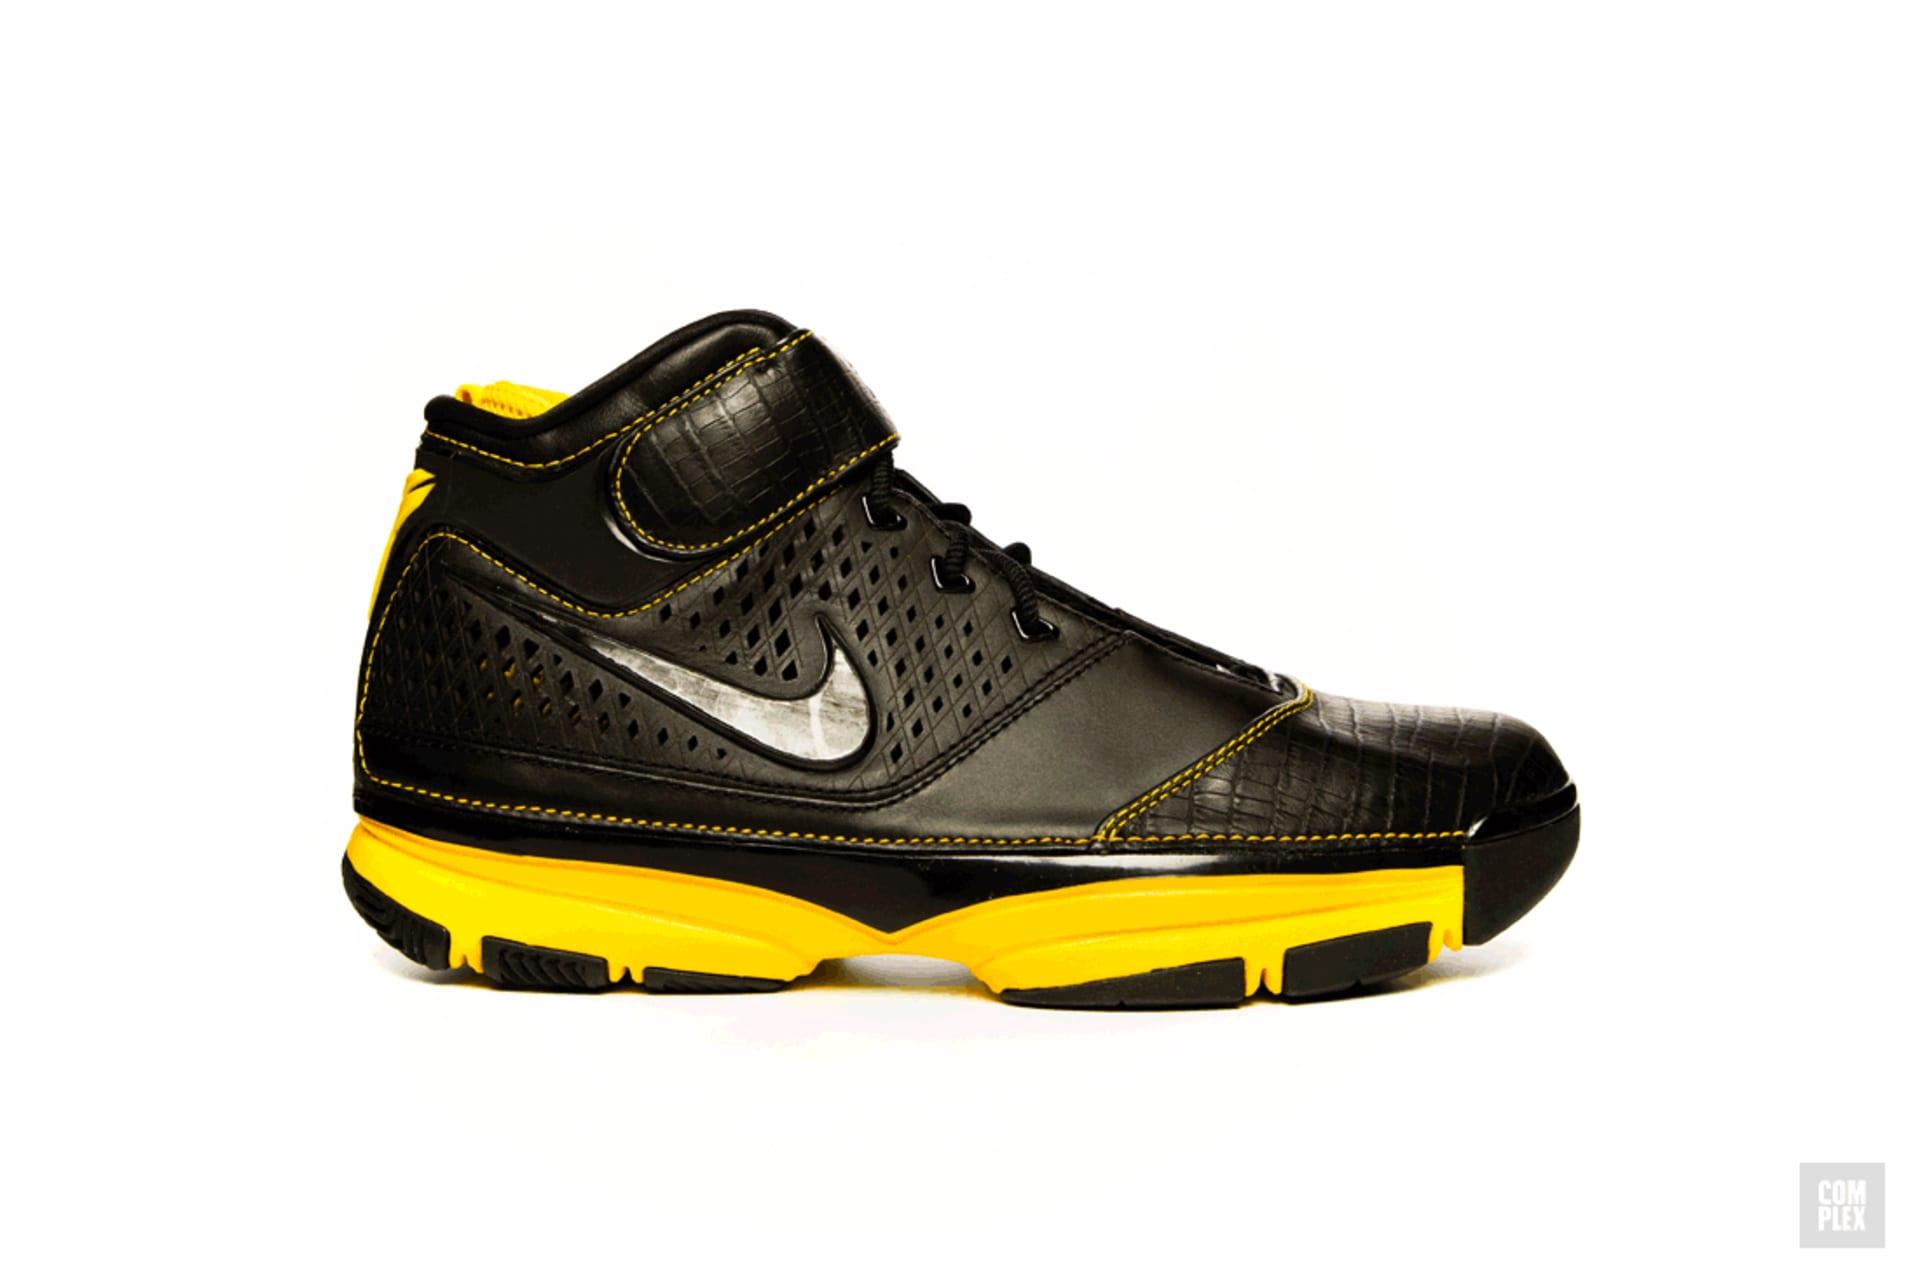 6503457c08a Kobe Bryant Signature Sneaker Design Evolution